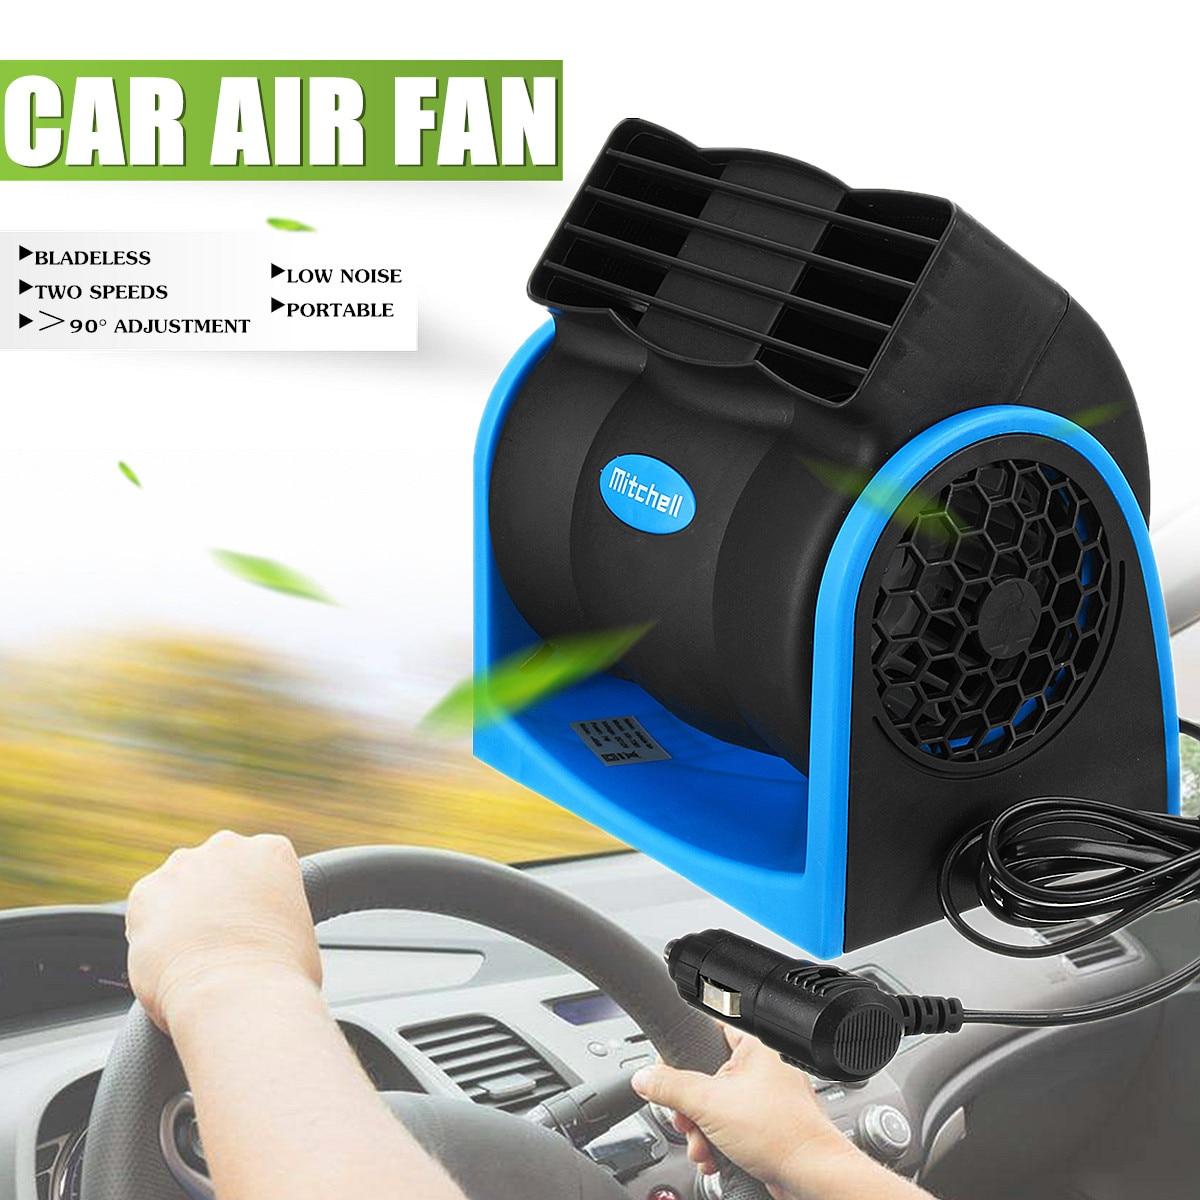 Fans Haushaltsgeräte Stumm Blattlosen Klimaanlage Fan Universal Auto Elektrische Fan Verstellbare Fahrzeug Turbofan Auto Kühler Für Baby Geräuscharm